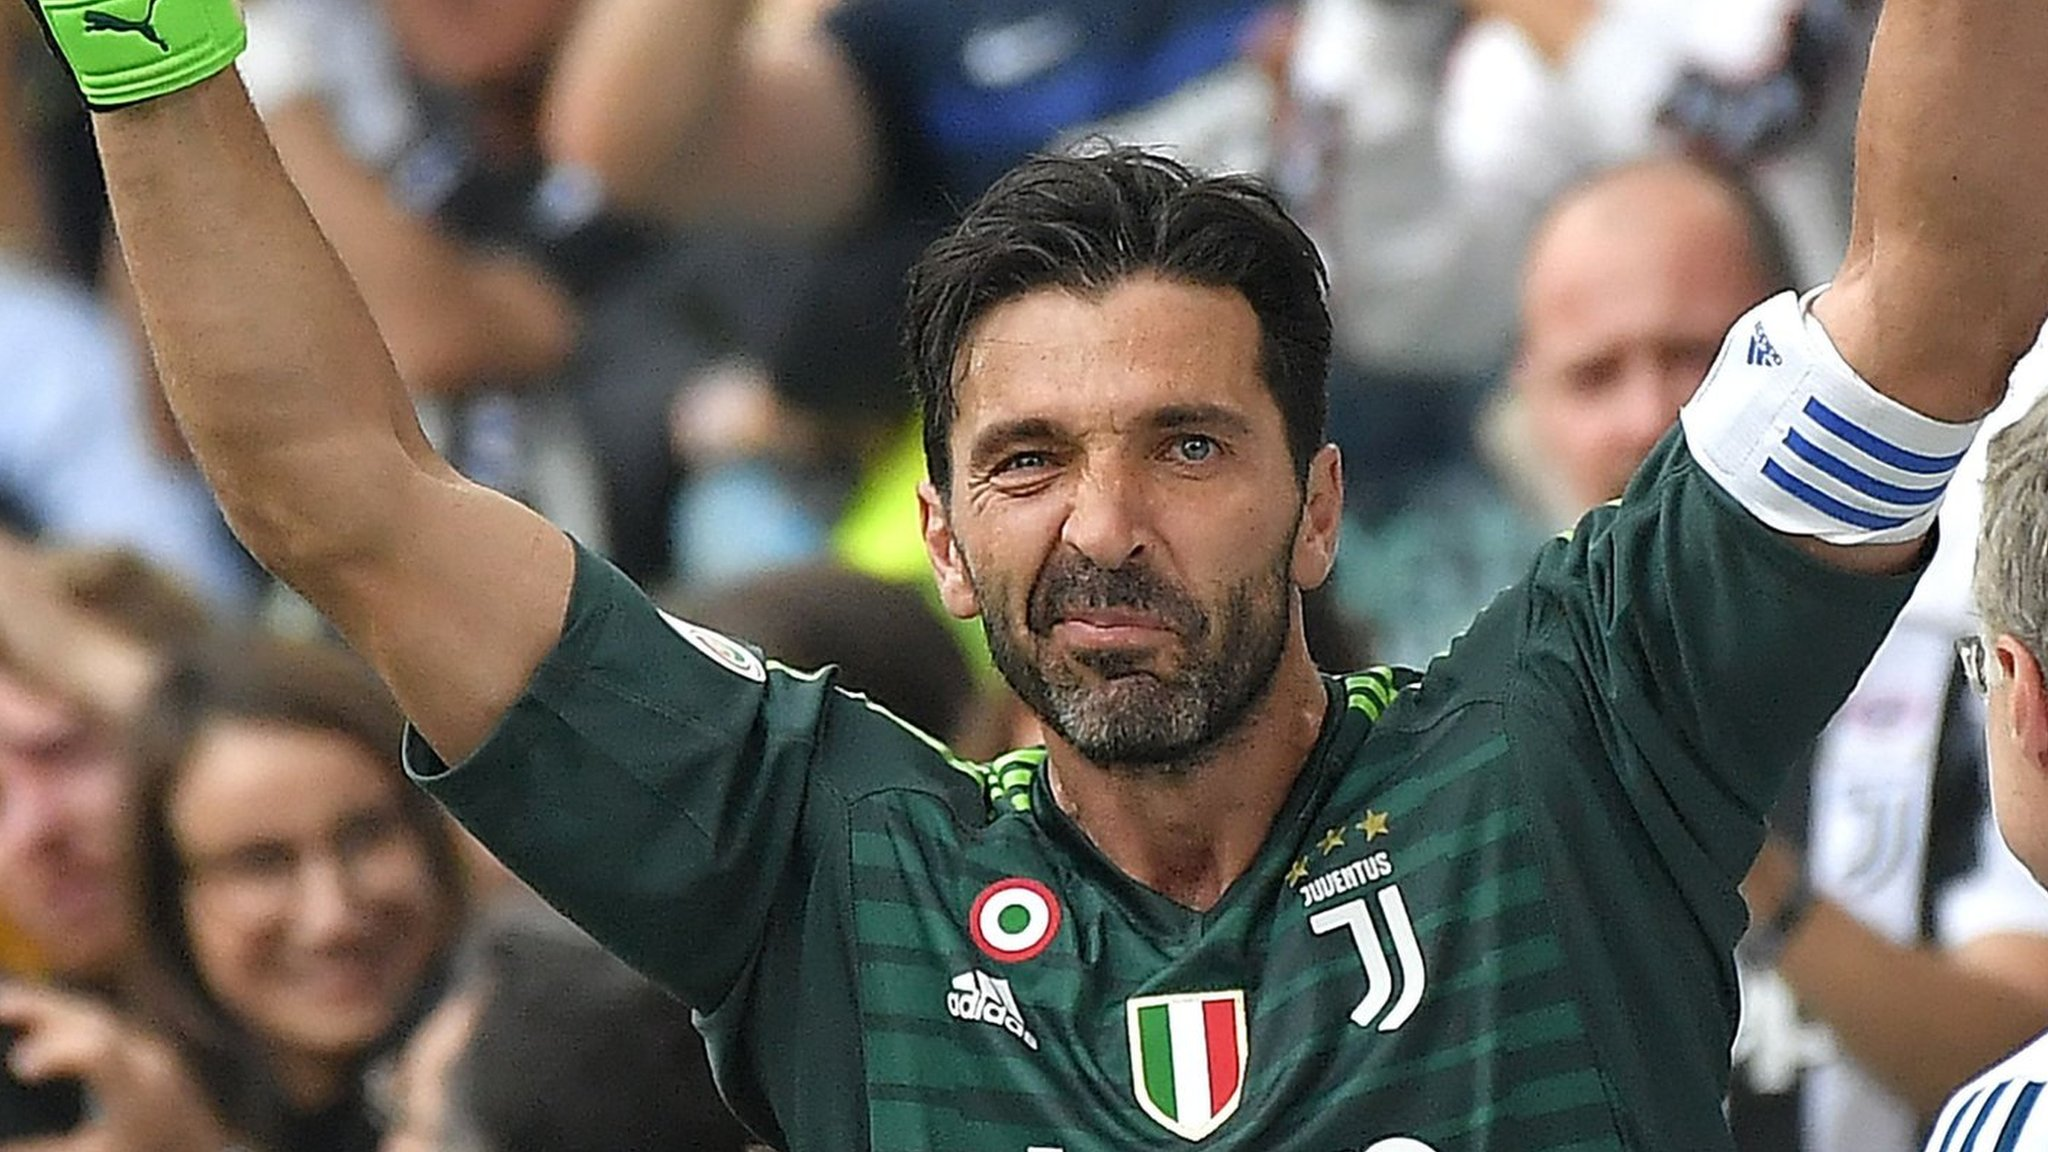 Buffon ends 17-year Juventus career with win